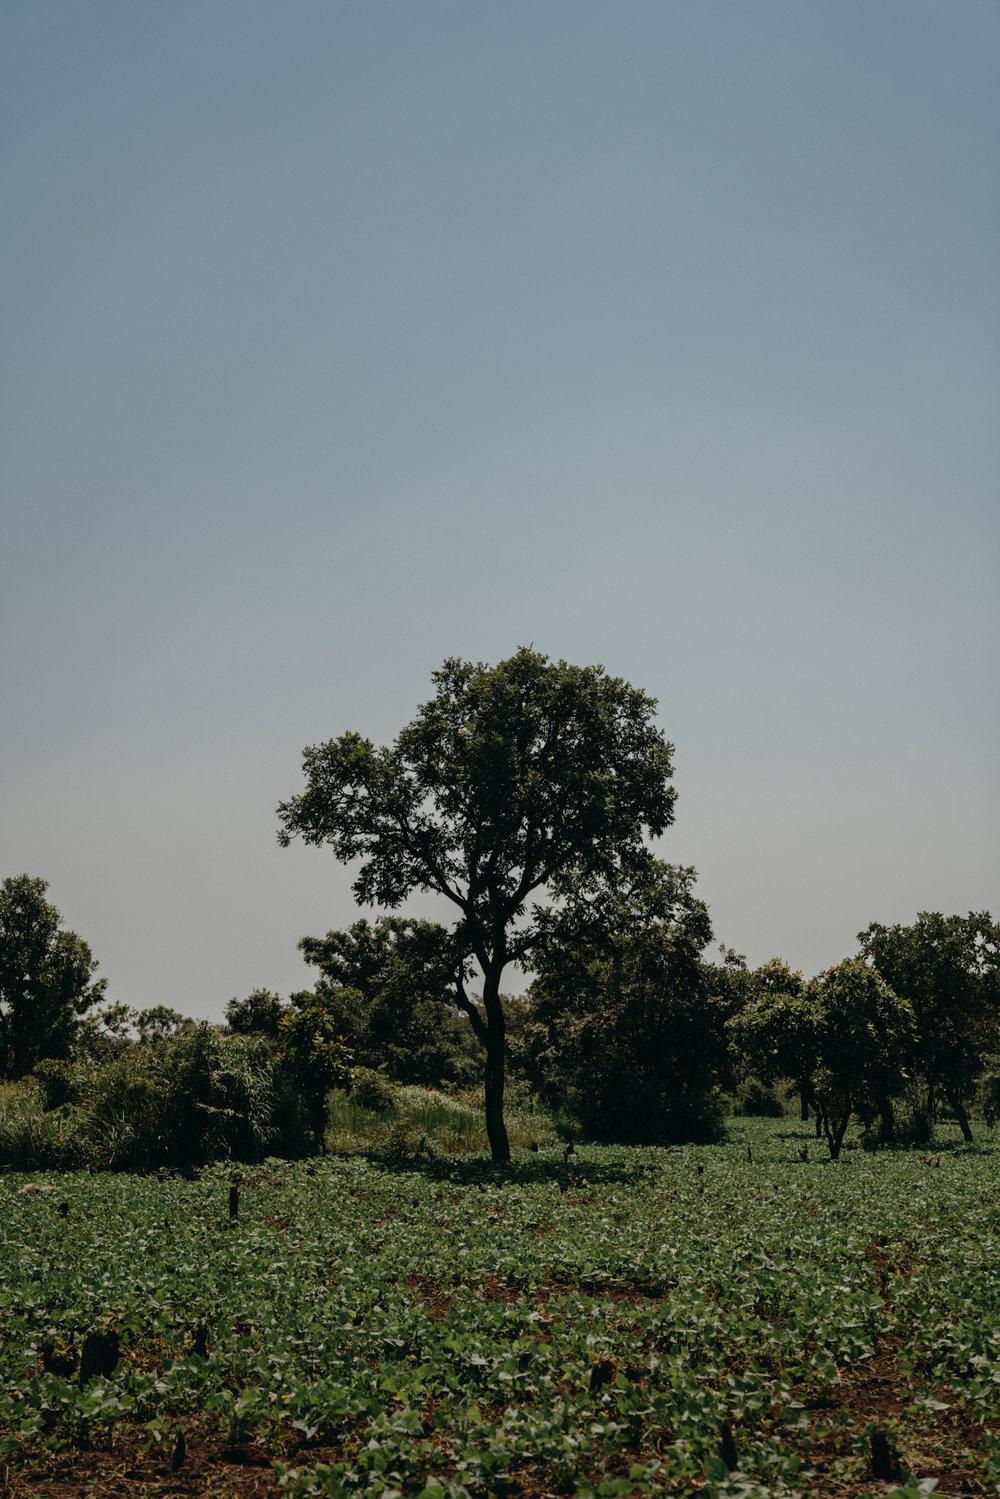 uganda july 2018-33.jpg